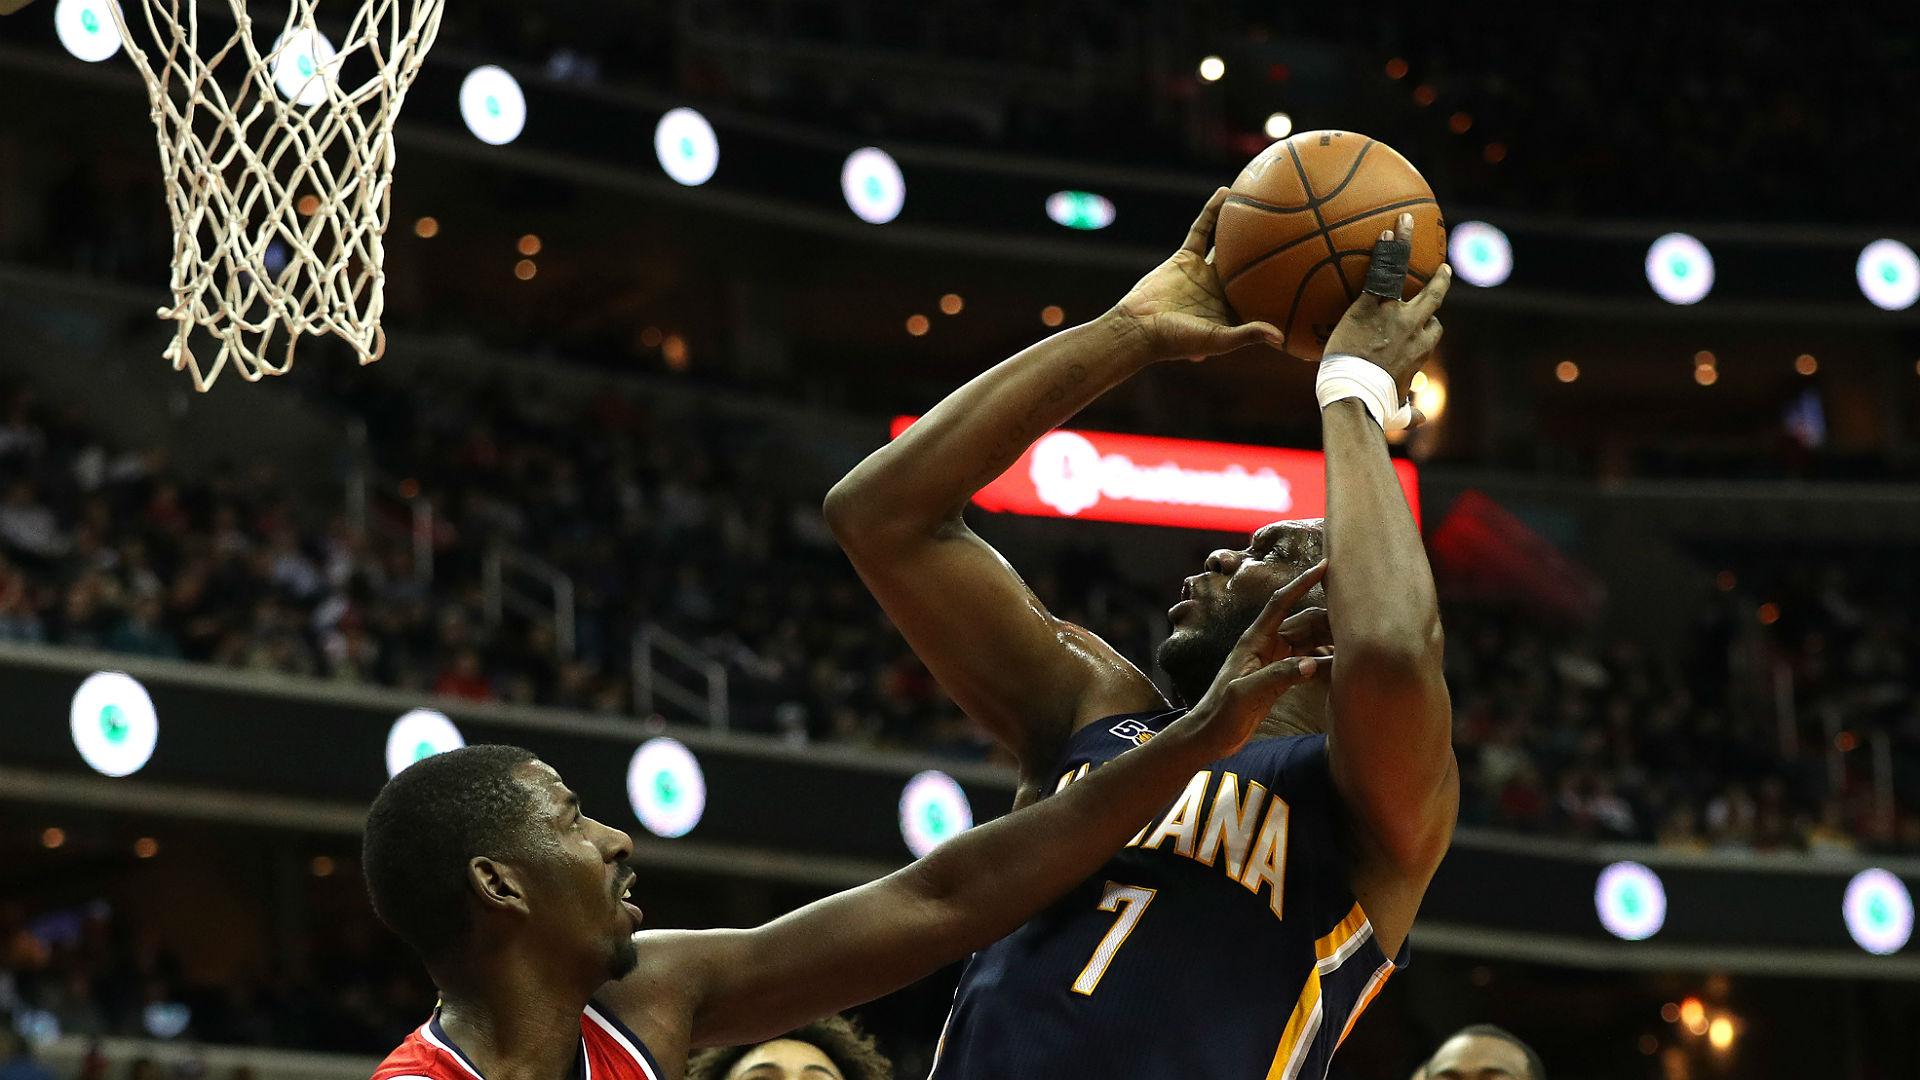 NBA free agency rumors: Pacers release veteran center Al Jefferson